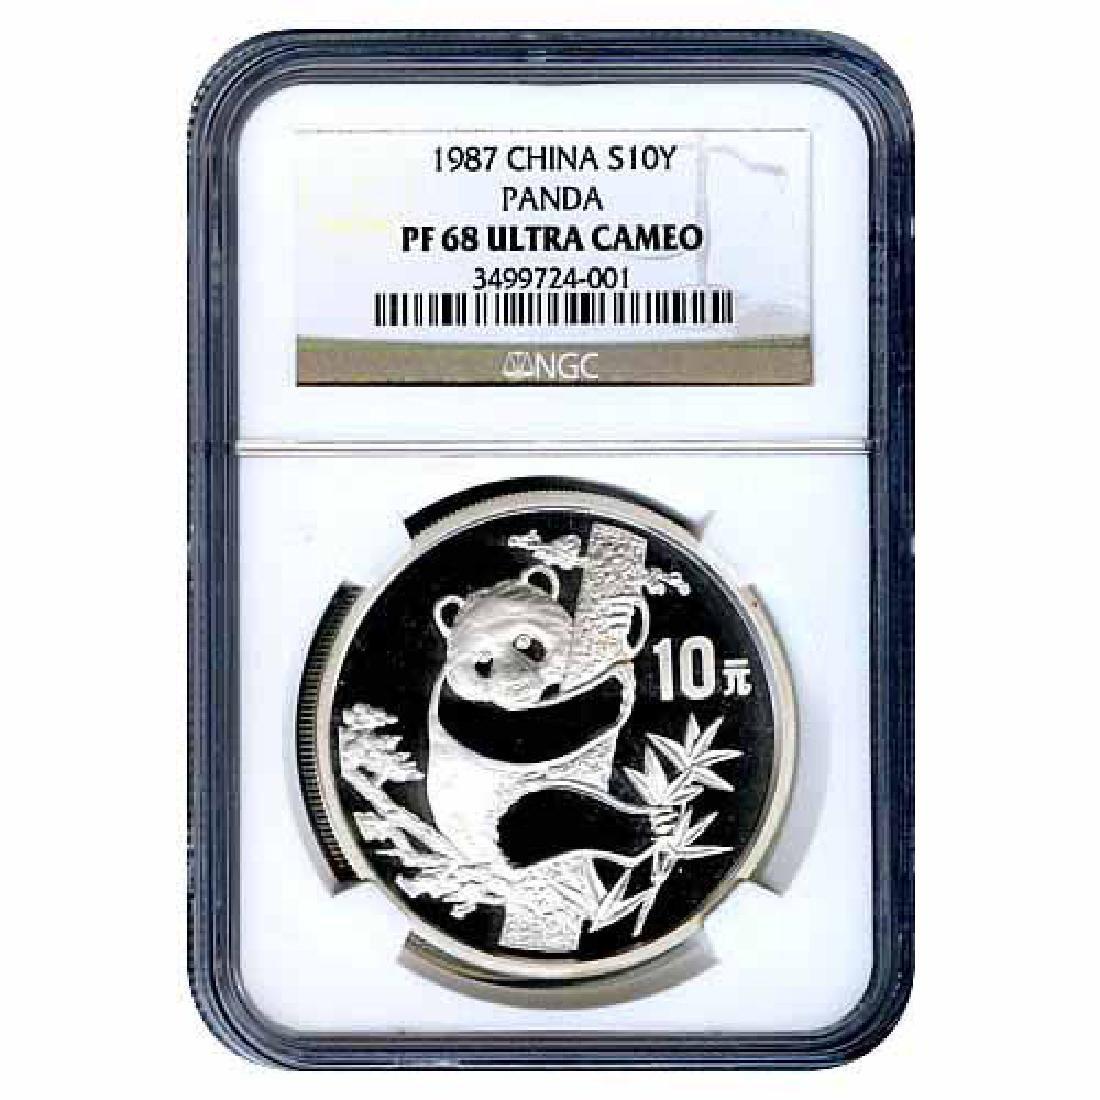 Certified Chinese Panda One Ounce 1987 PF68 NGC